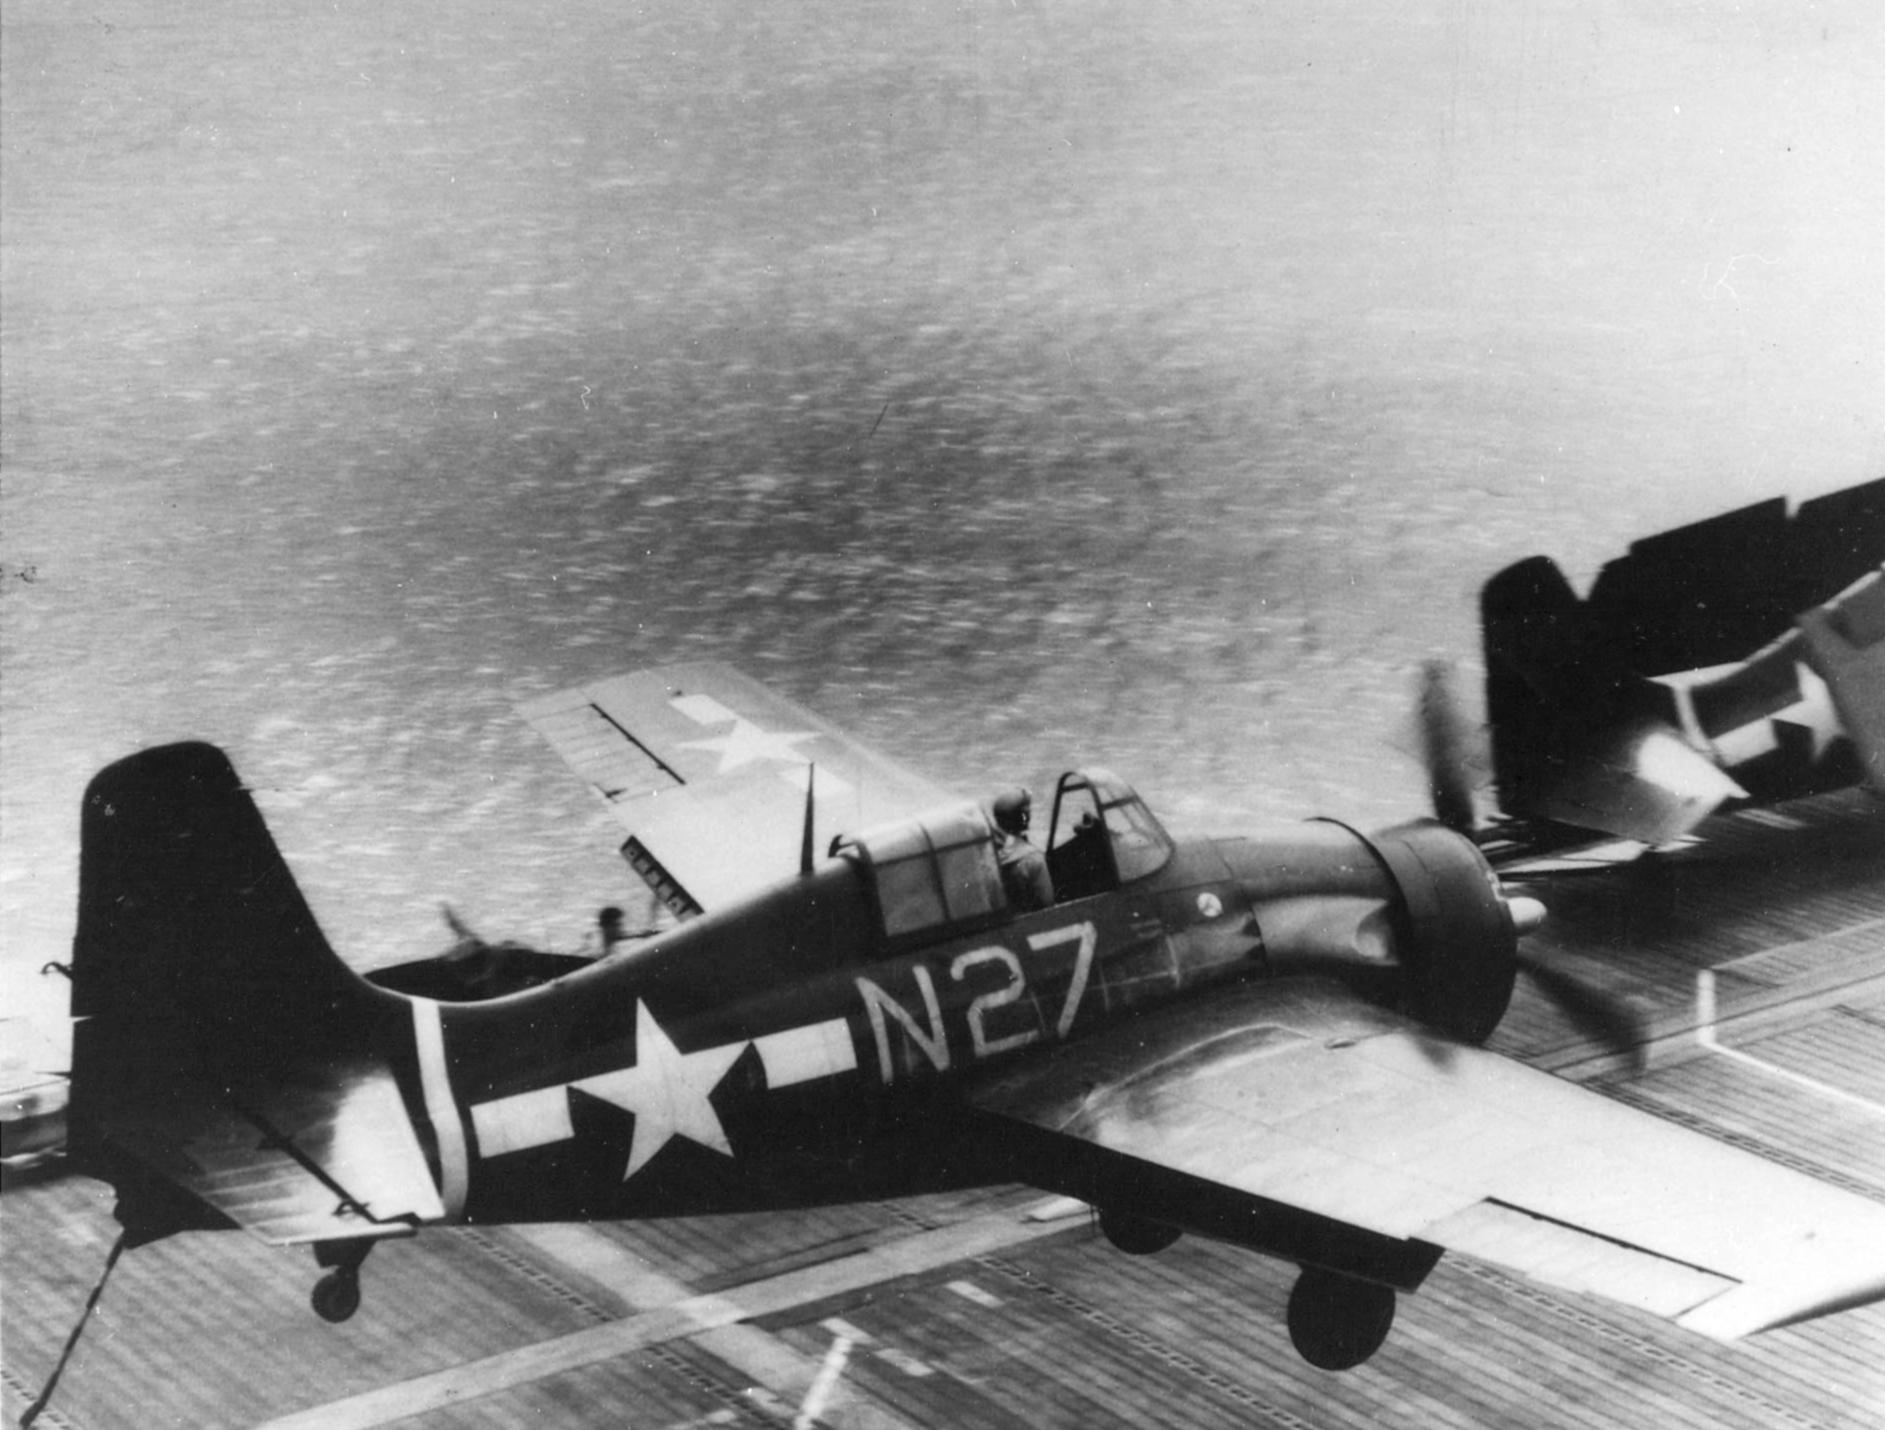 FM 2 Wildcat VC 86 White N27 landing mishap CVE 95 USS Bismarck Sea 1944 01